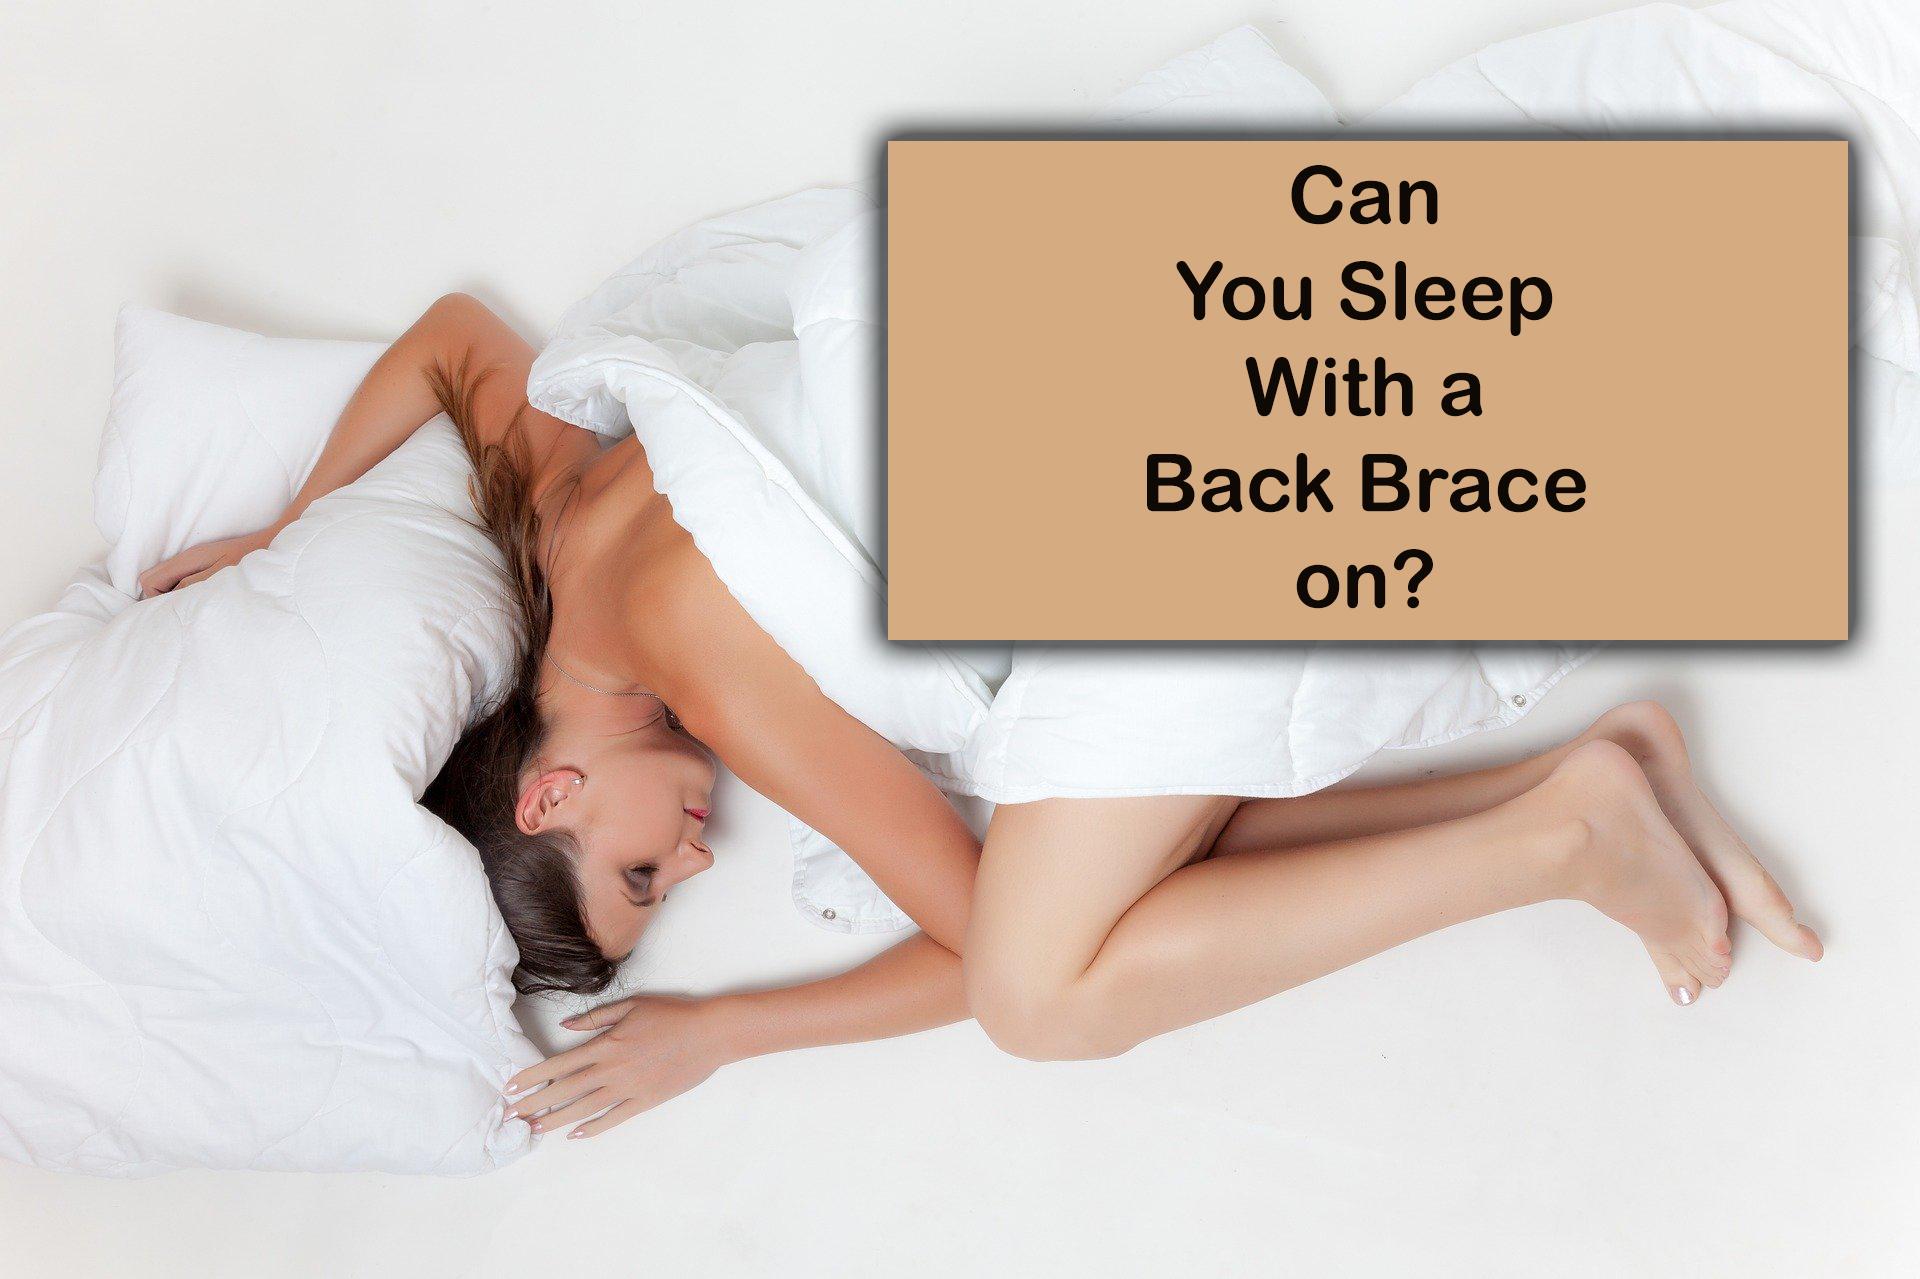 can you sleep with a back brace on